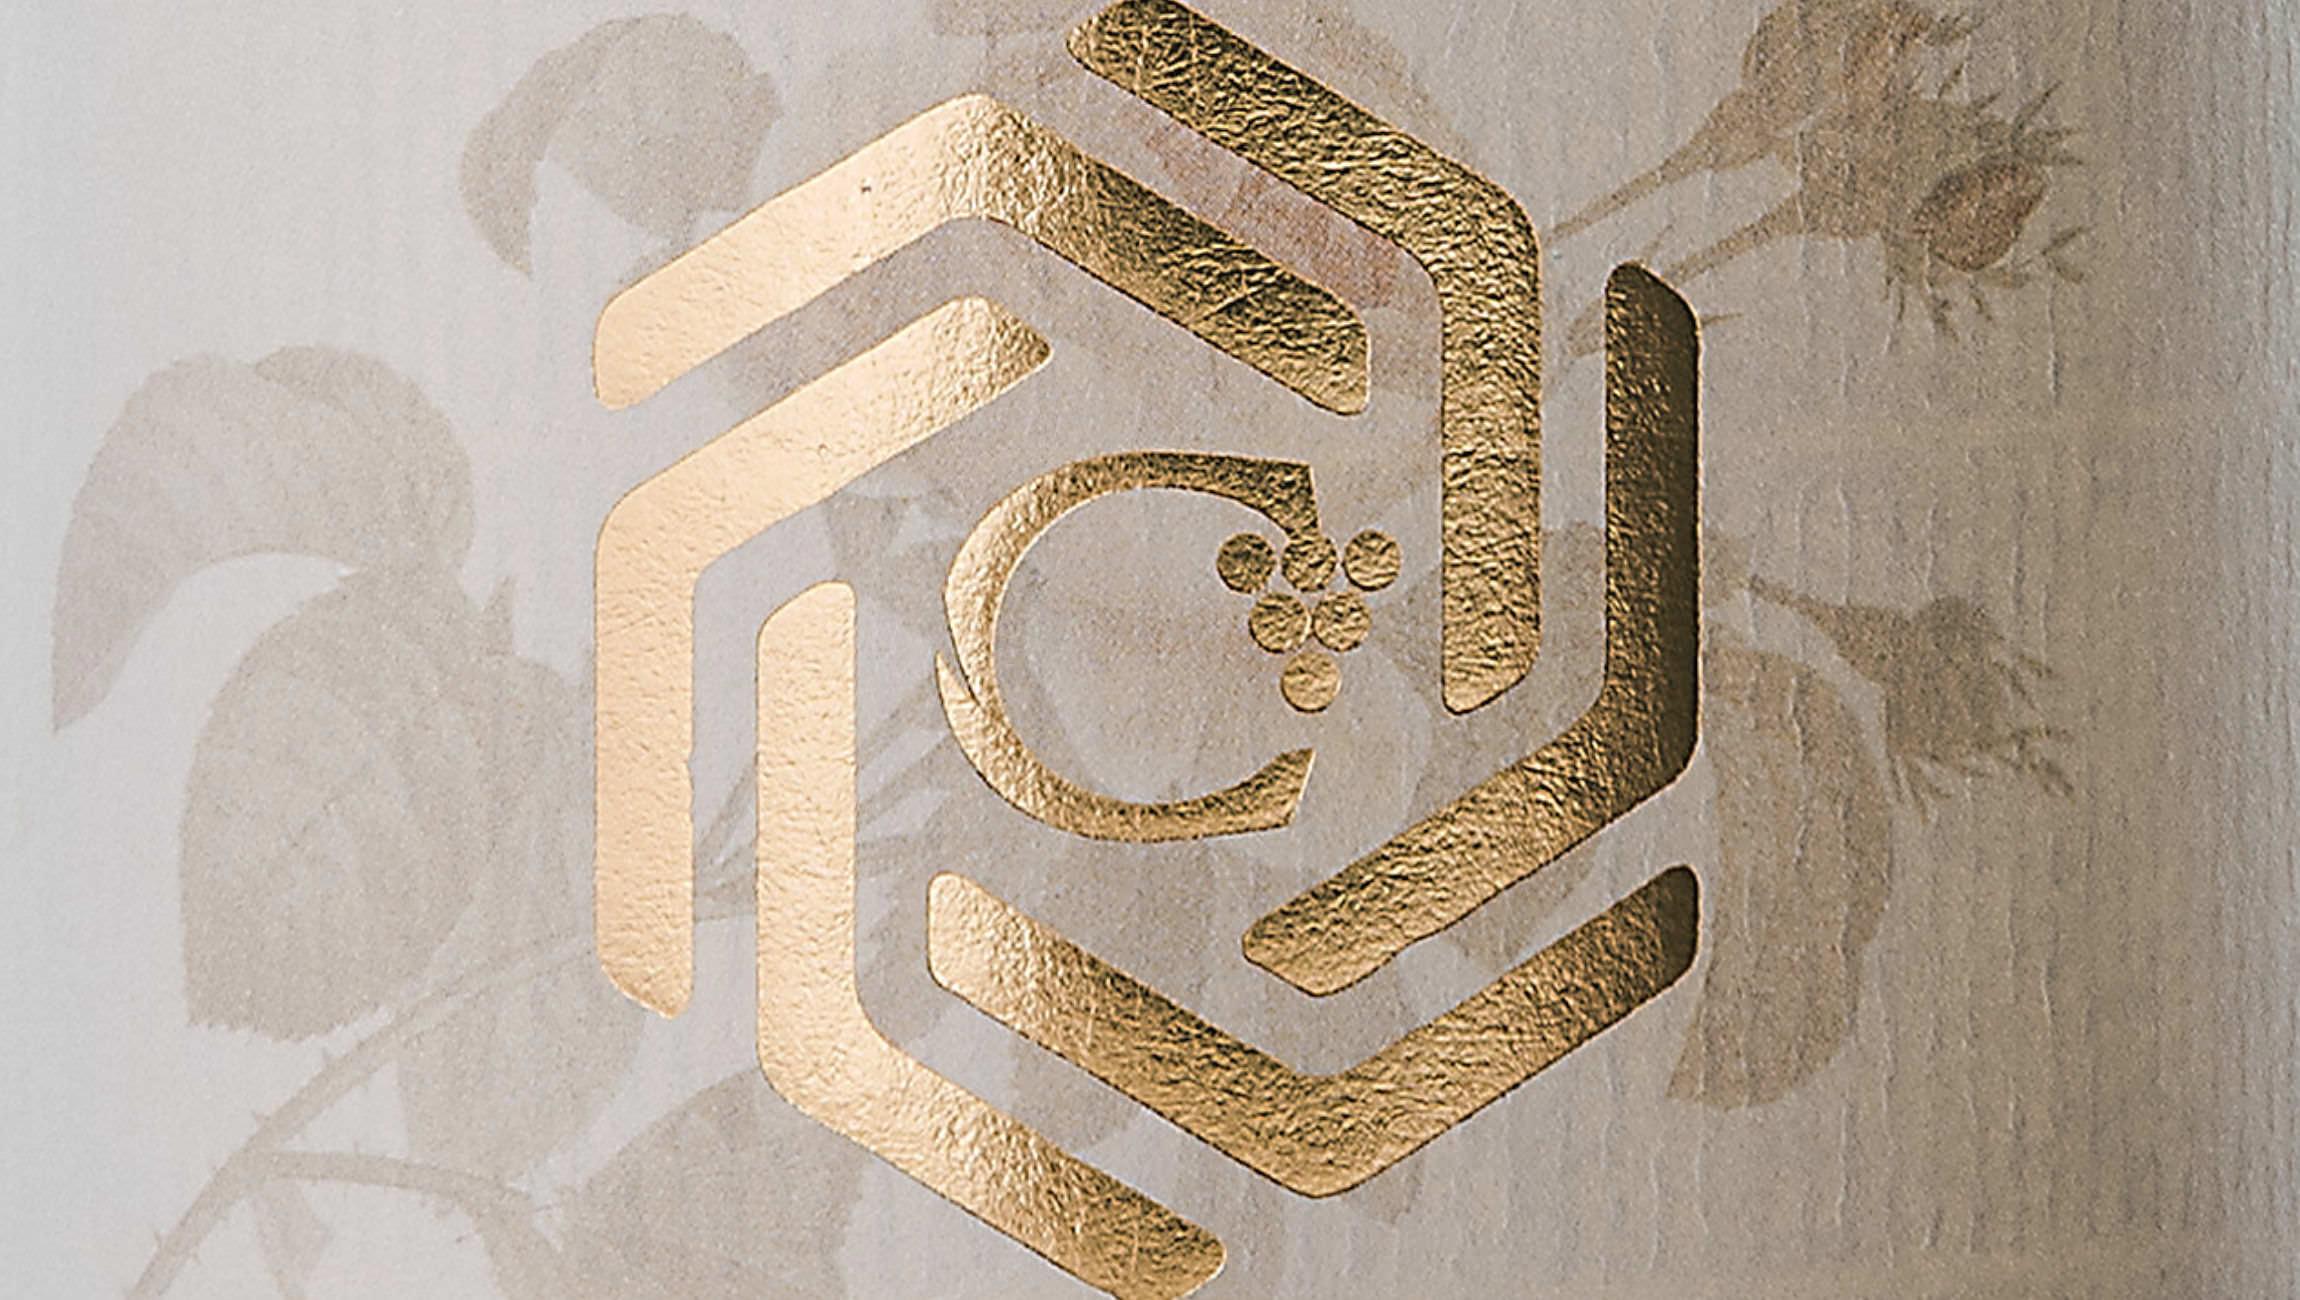 Design Etichetta Pecorino Centanni Vini - Design Rossomura